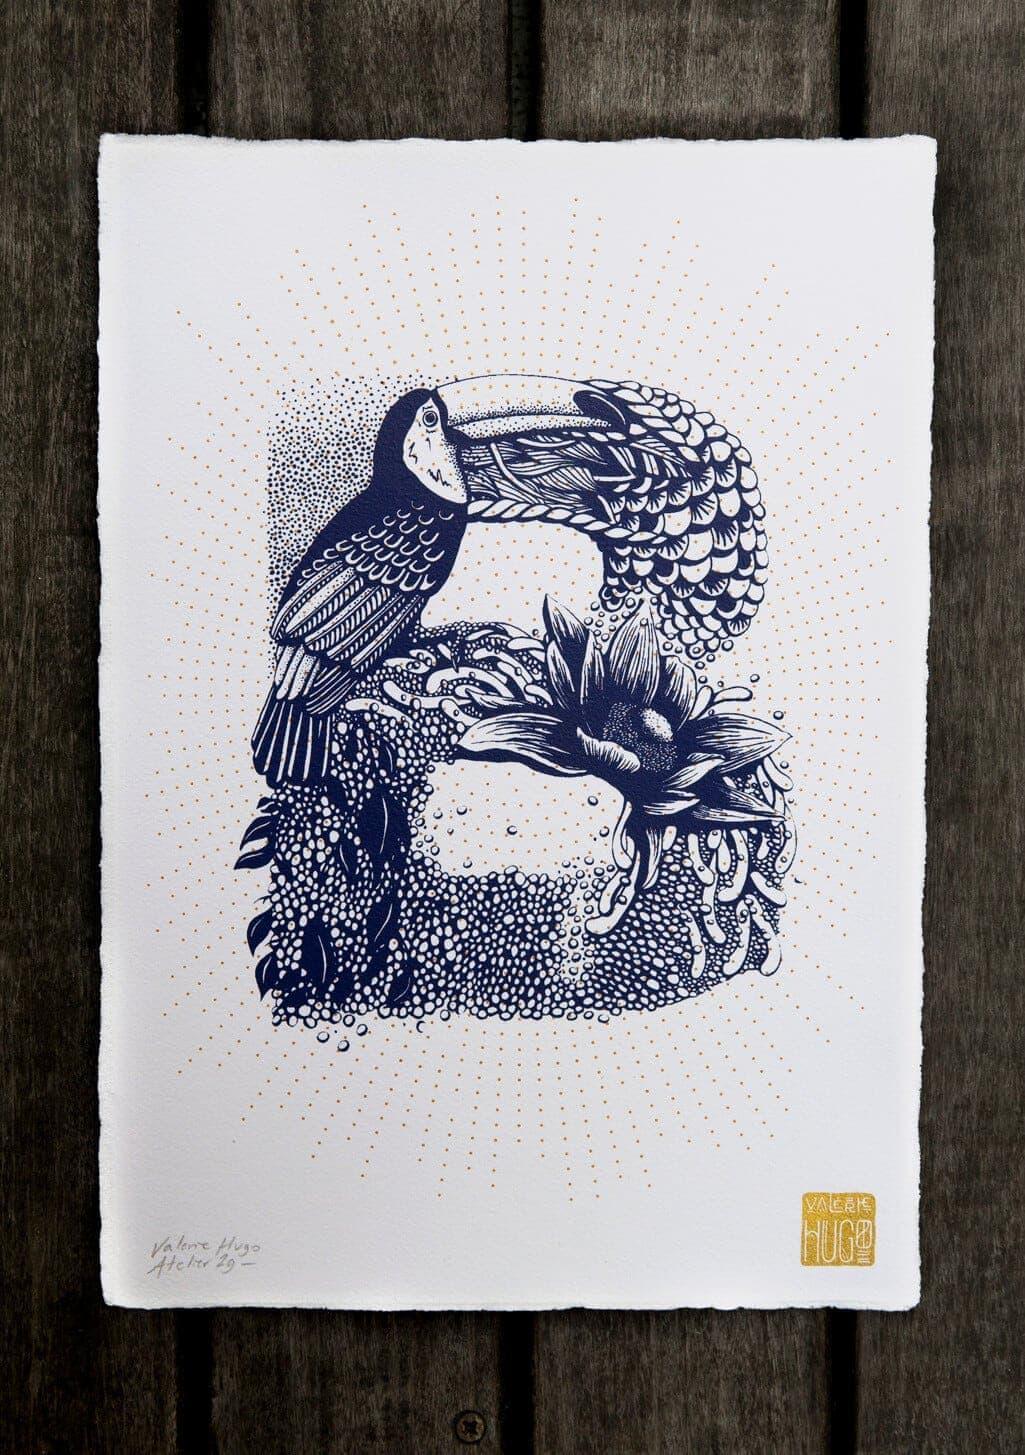 typography valerie hugo fy 2 1